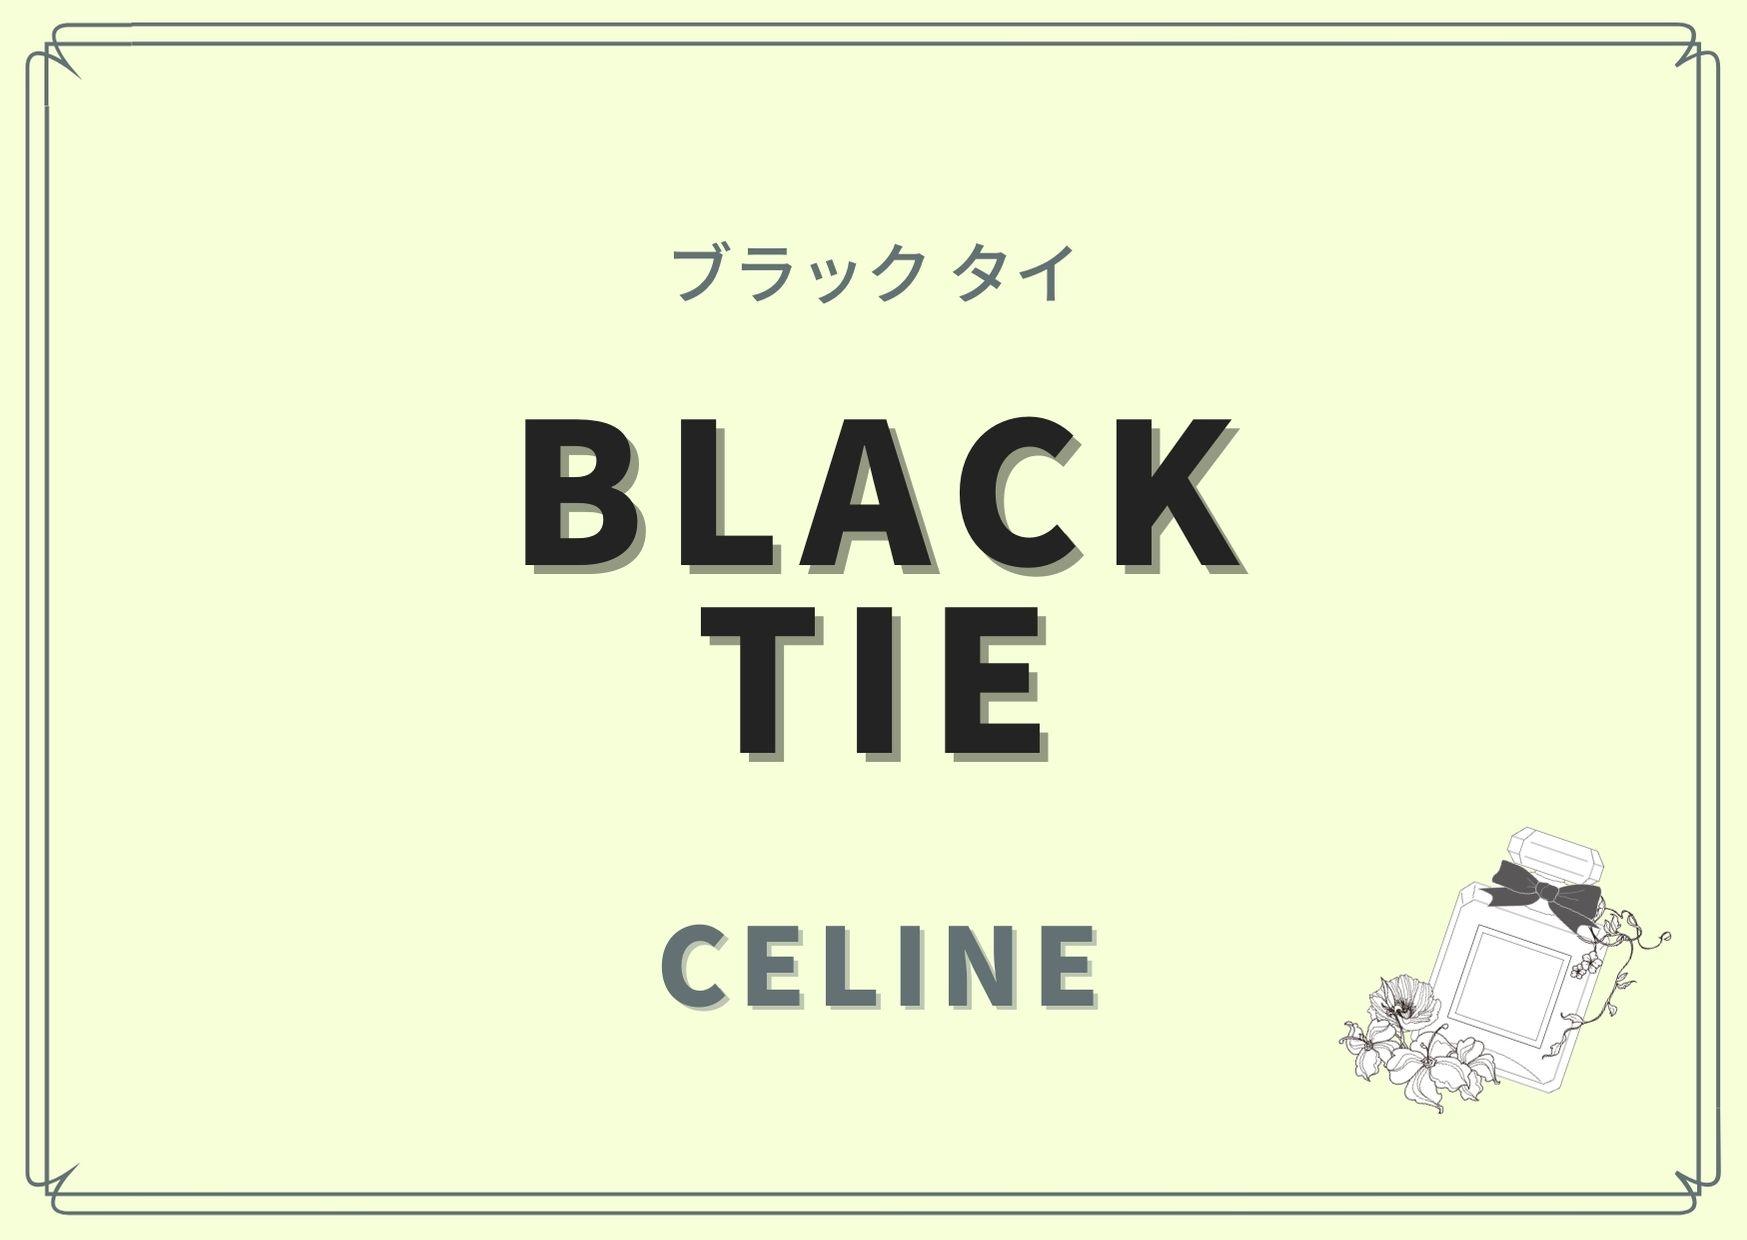 BLACK TIE(ブラック タイ)/CELINE(セリーヌ)